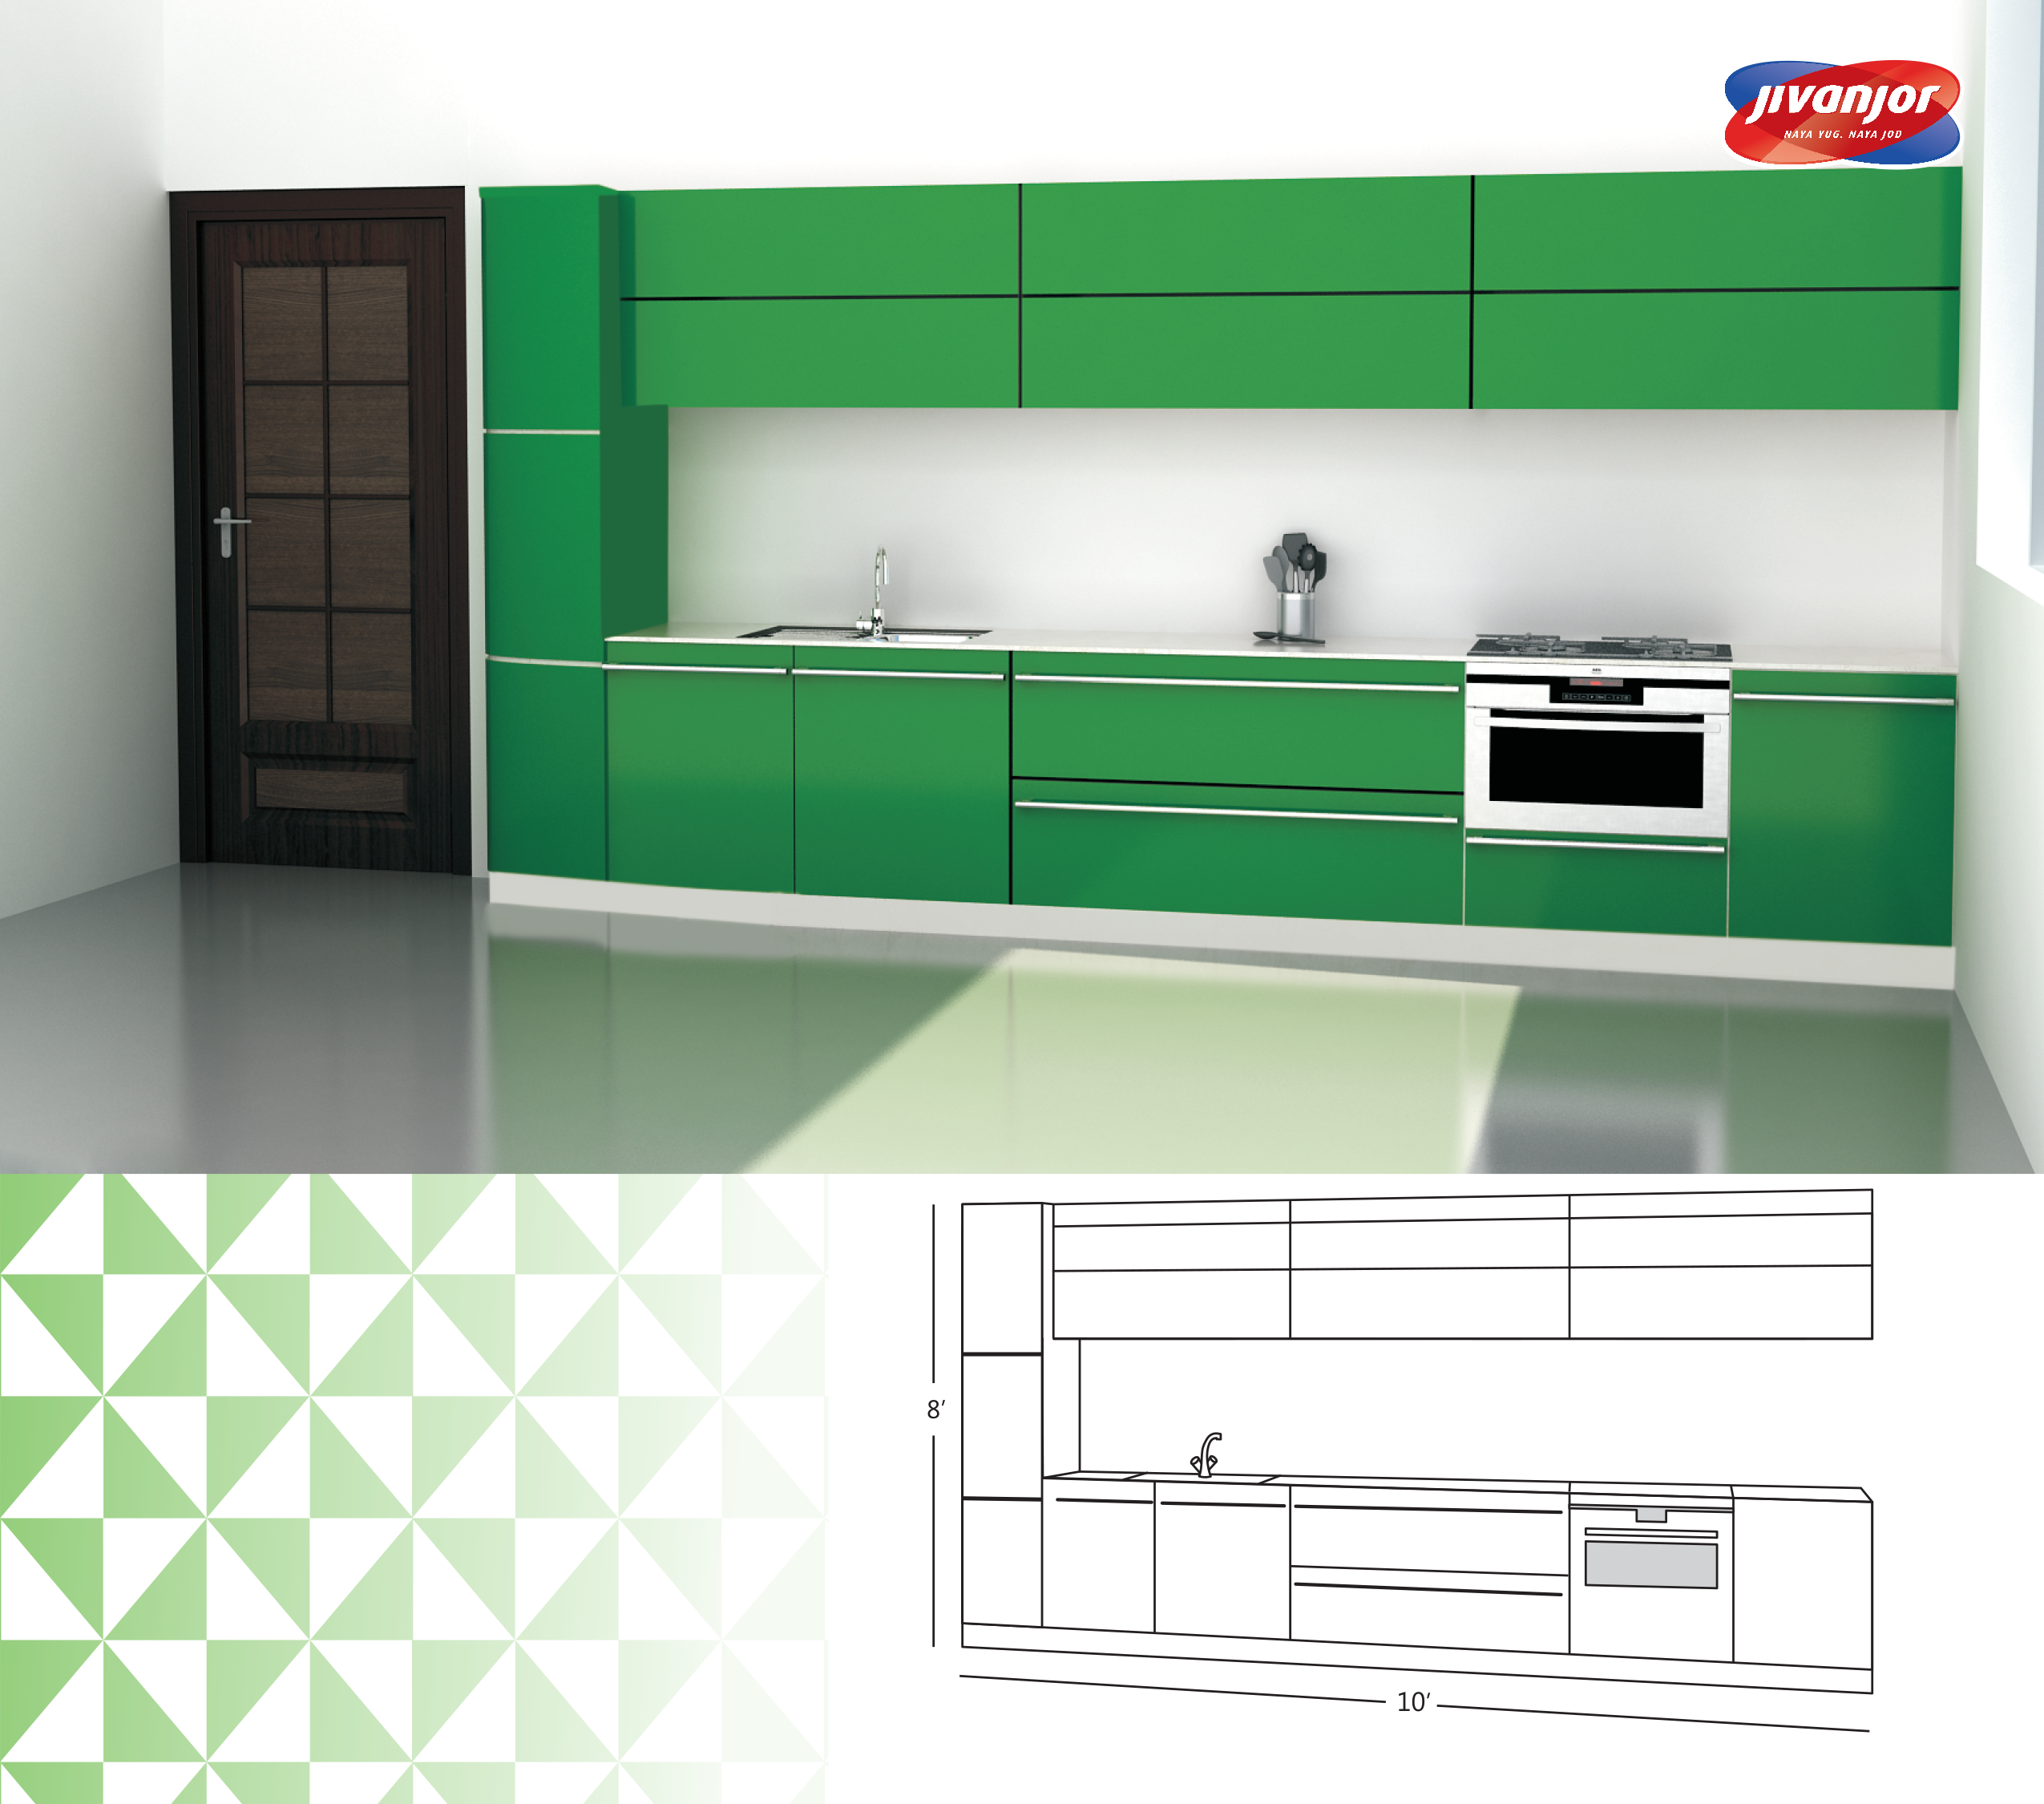 Single Line Kitchen Design with an Inbuilt Oven